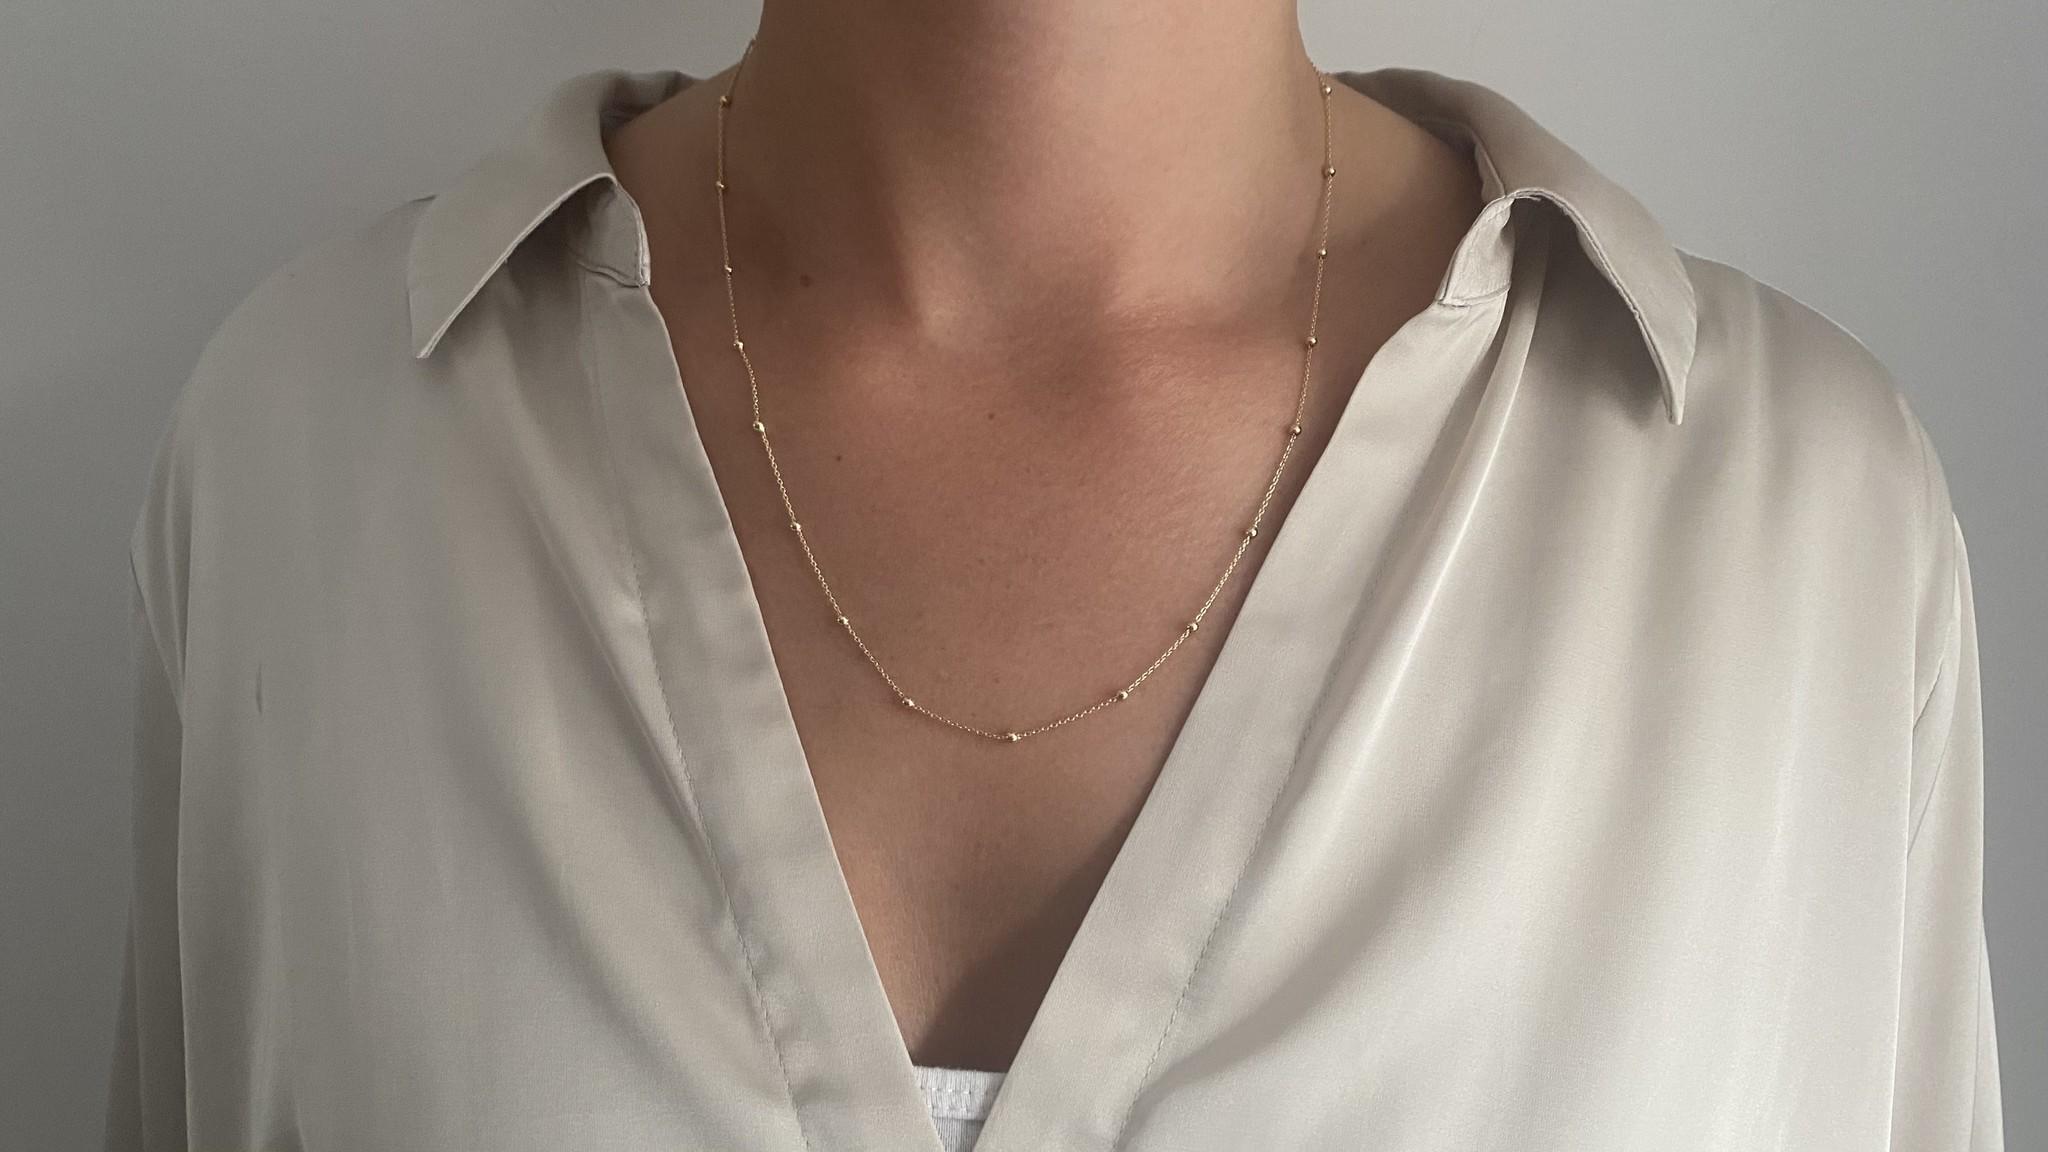 Ketting subtiele chain met balletjes-2